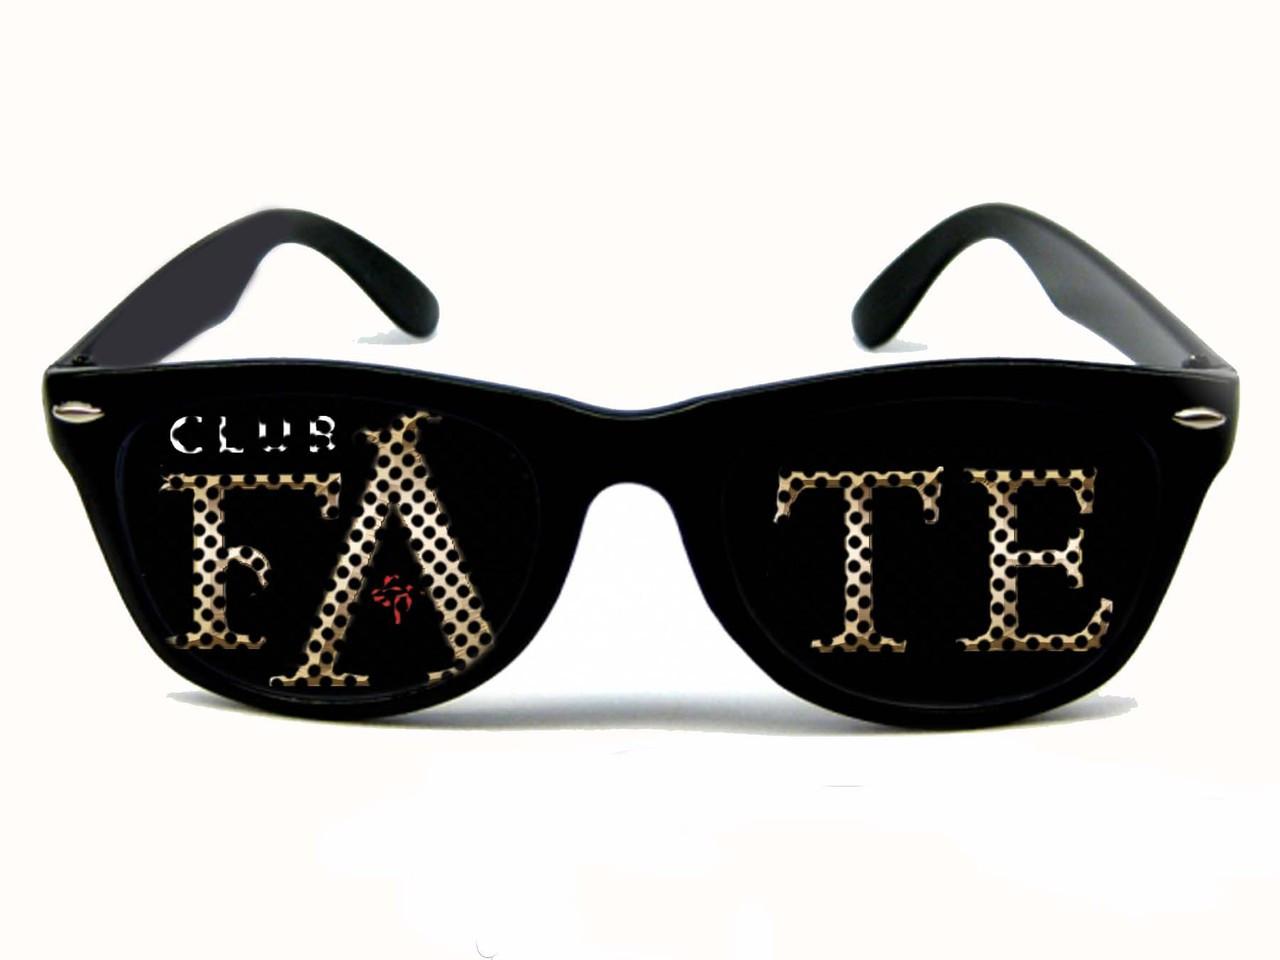 Party Favor Sunglasses Personalized | Louisiana Bucket Brigade